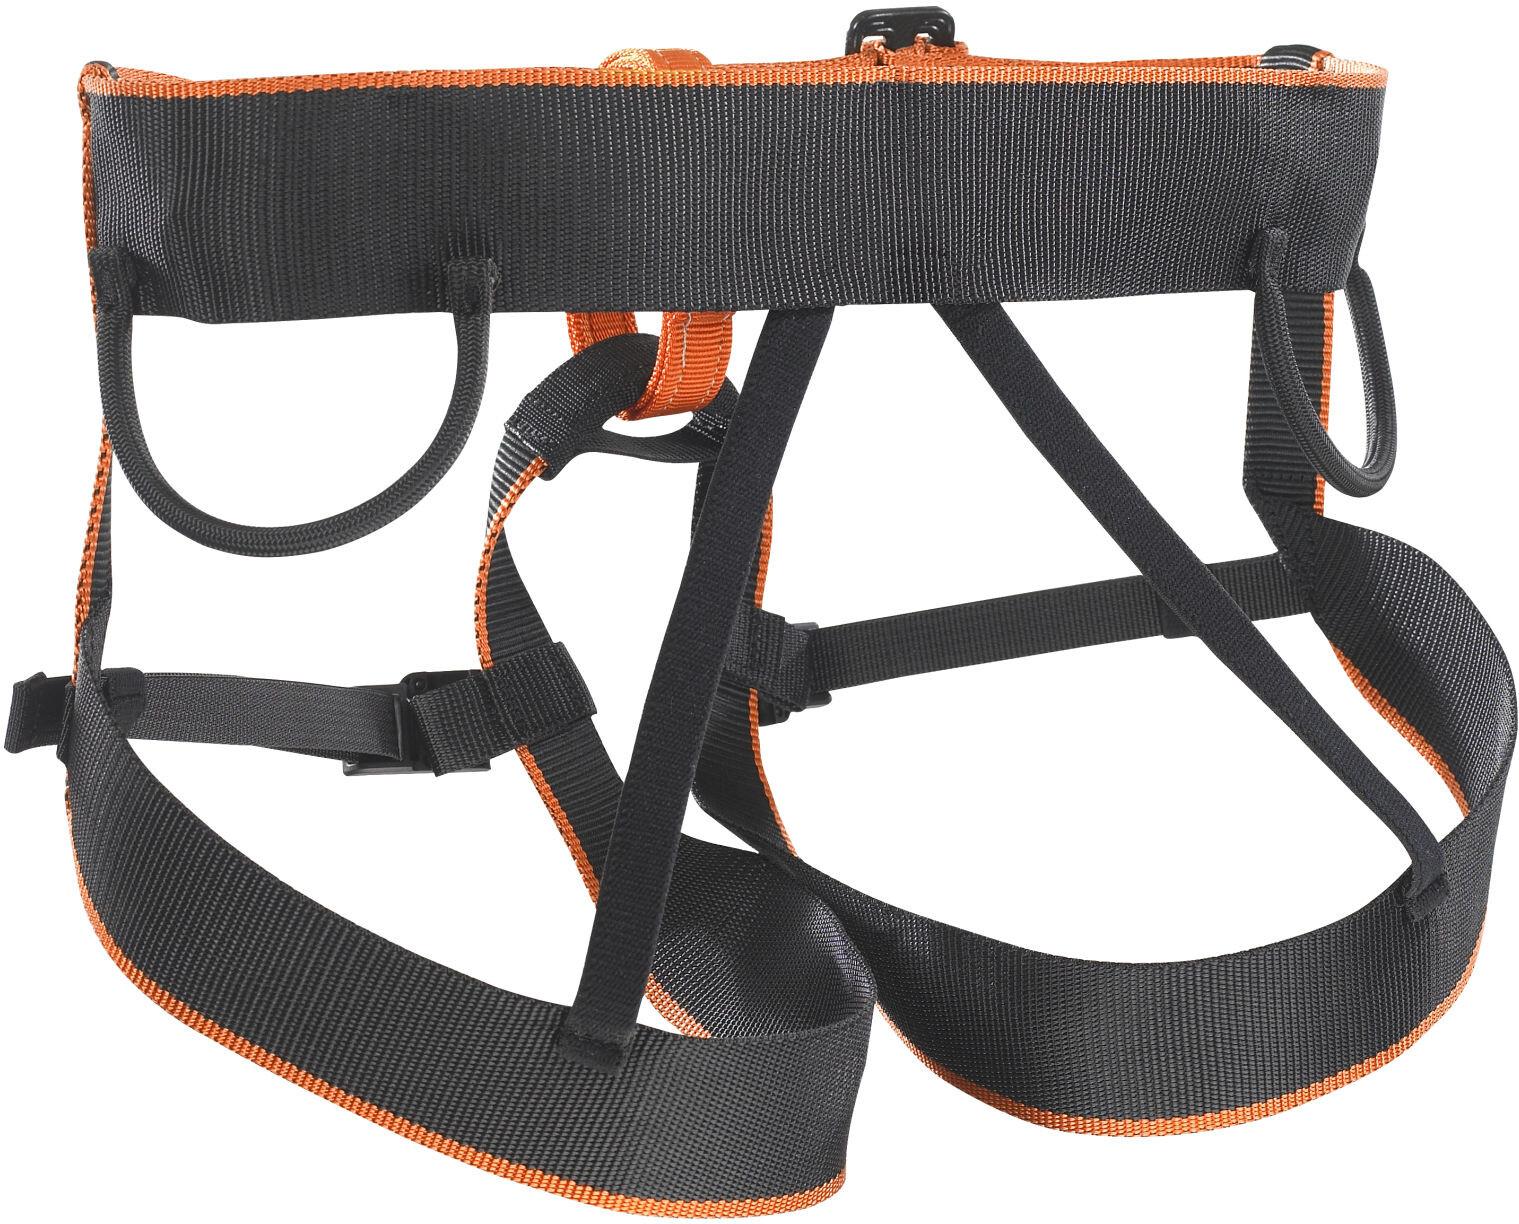 Klettergurt Kinder Skylotec : Skylotec pyrit harness kids black orange campz